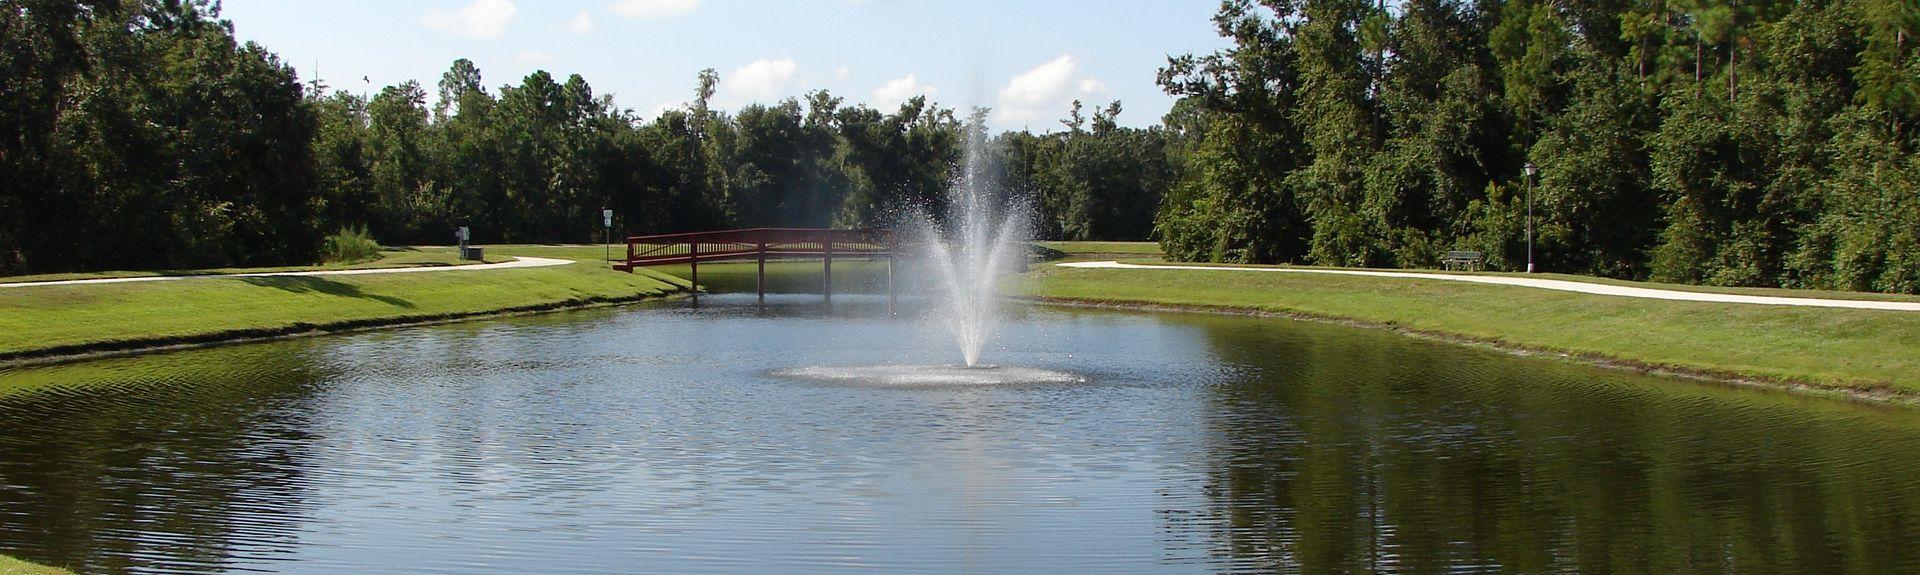 Liberty Village, Kissimmee, FL, USA